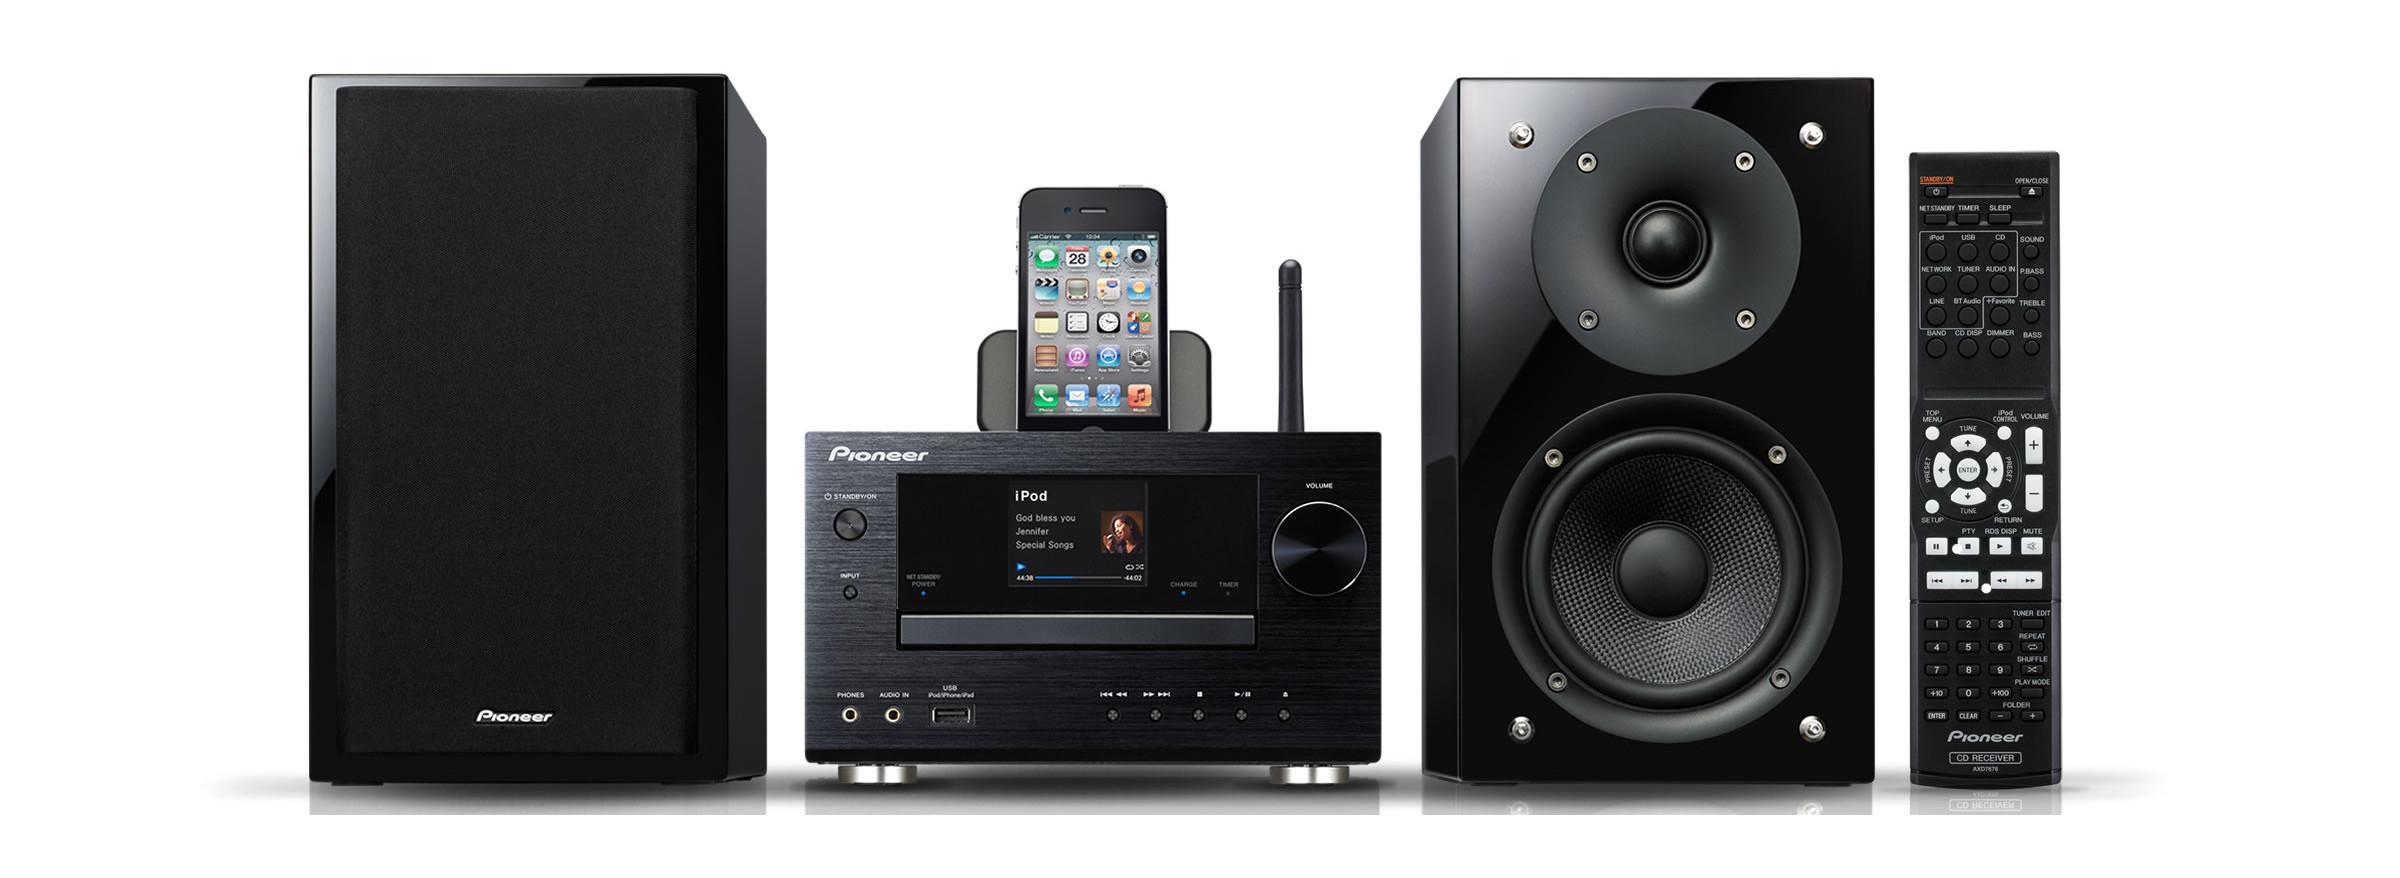 Специалист по ремонту: Аудио и Видео техники